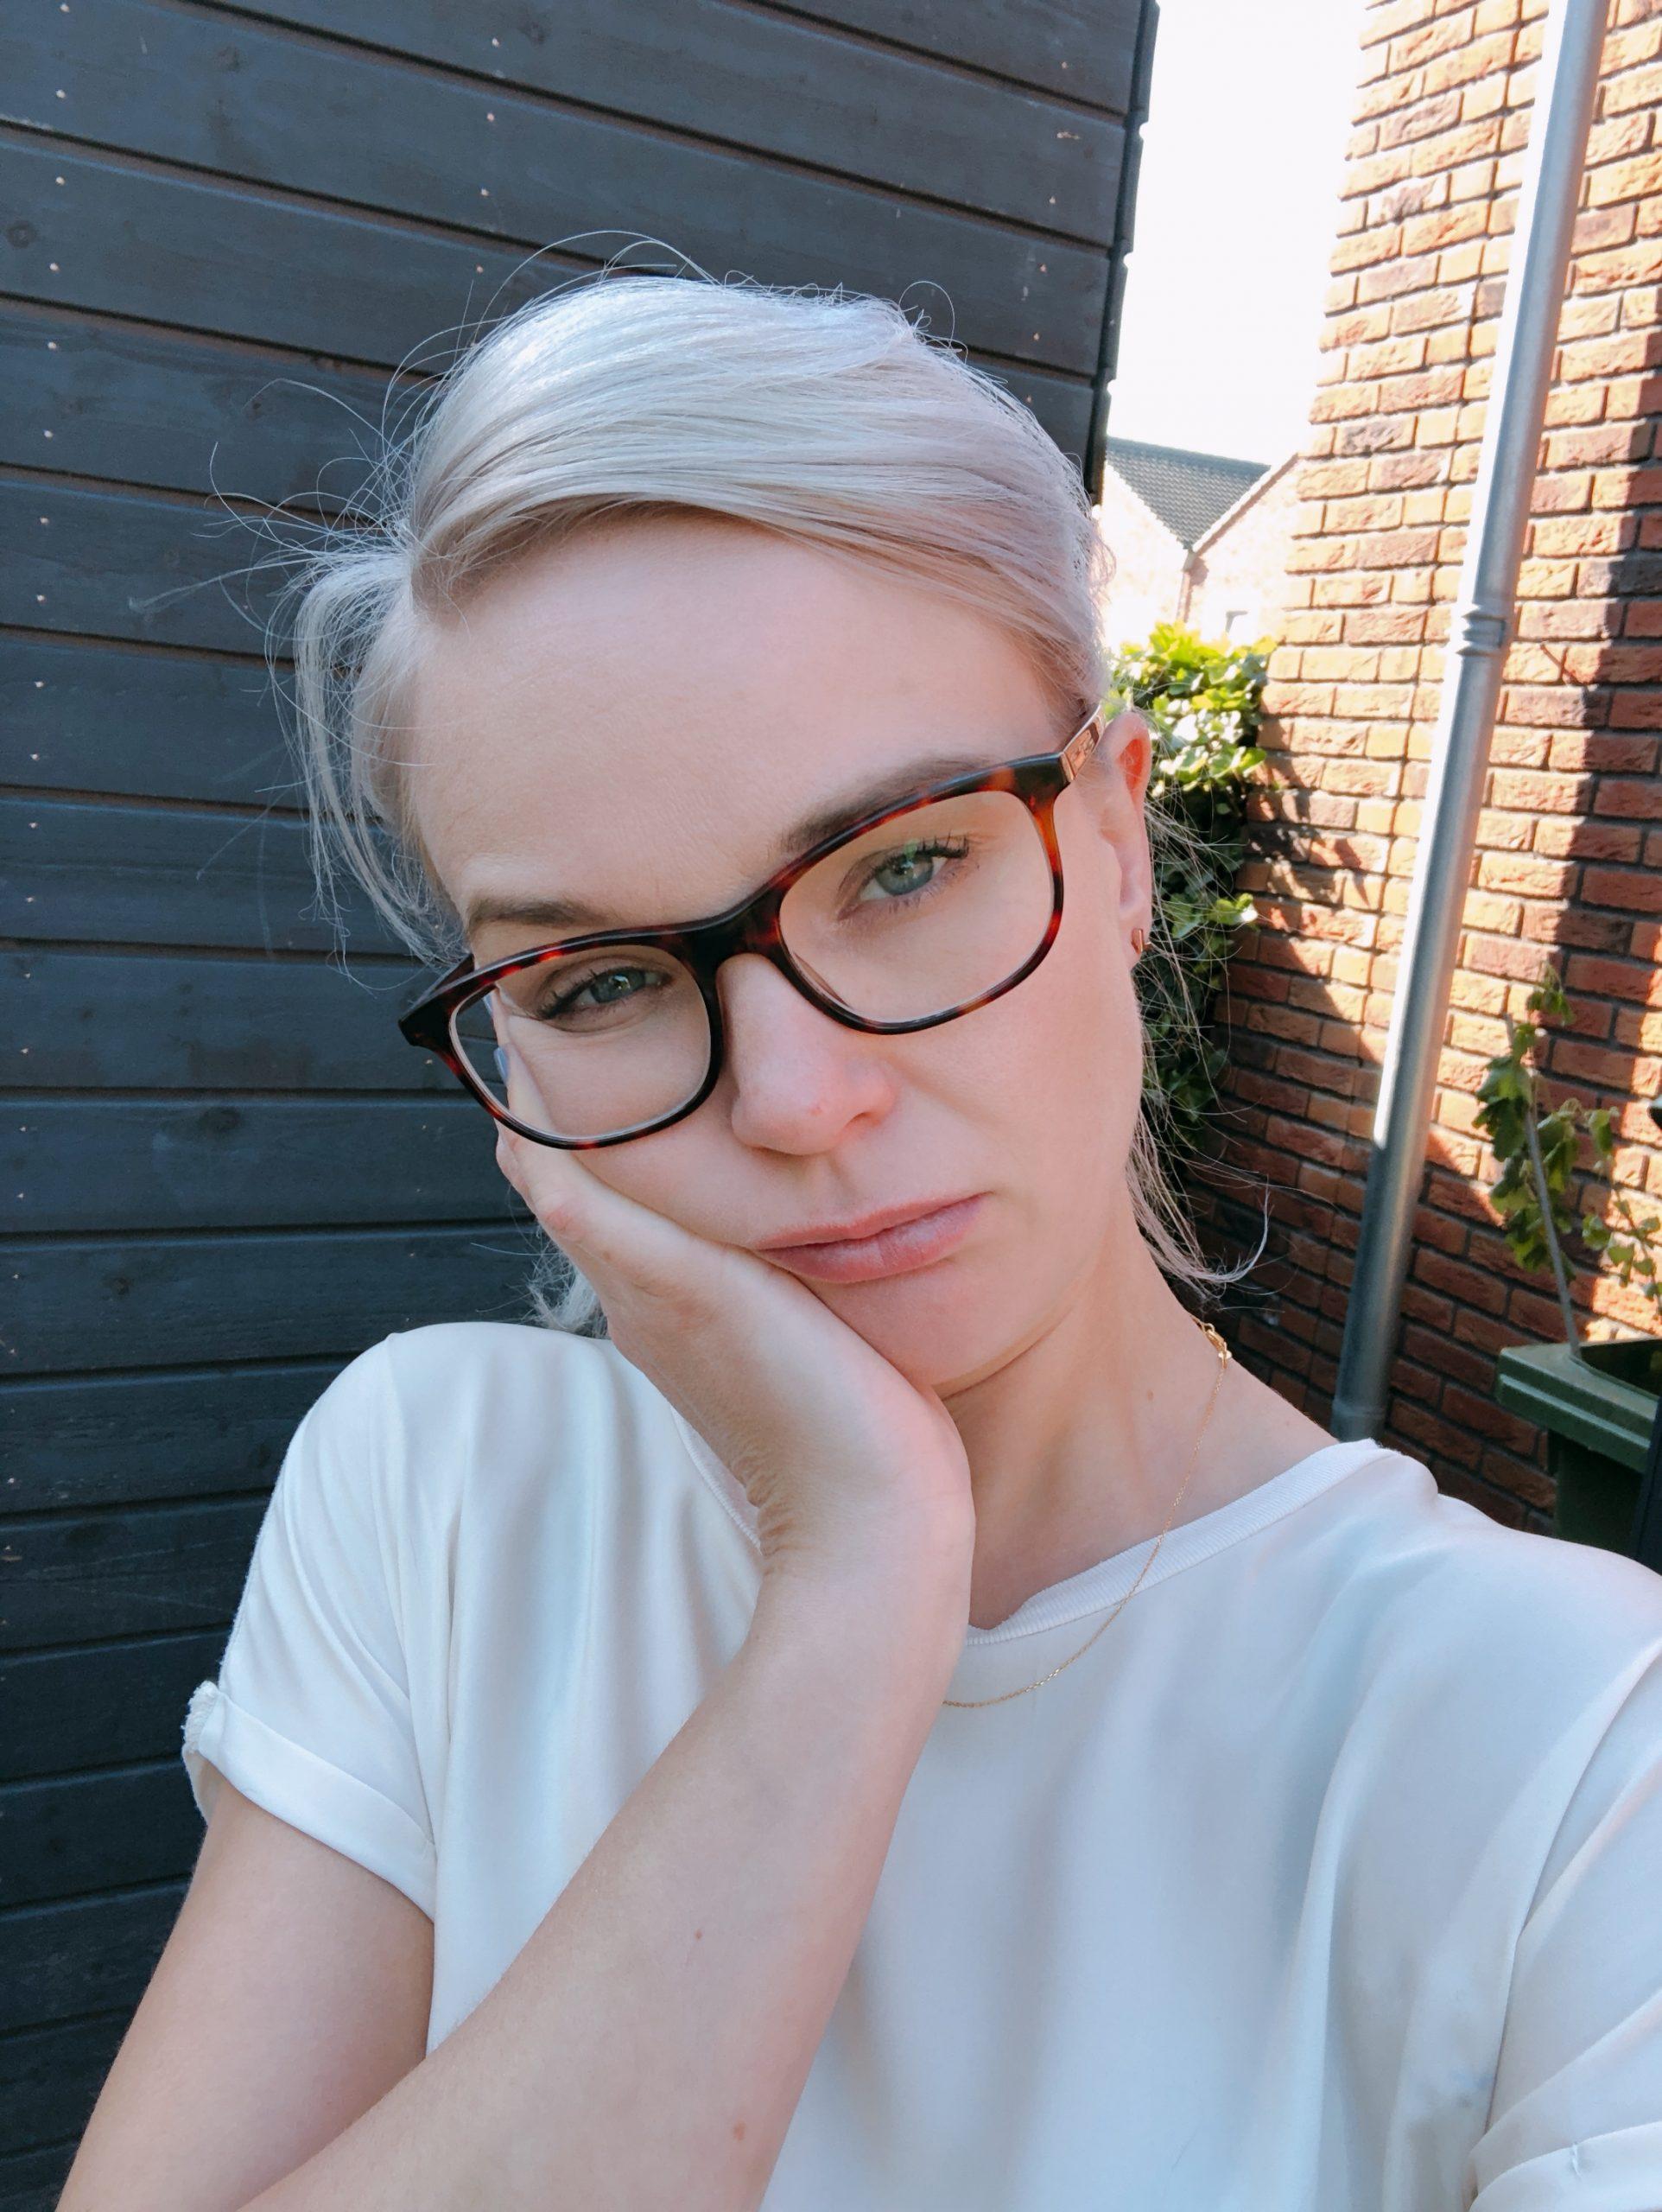 IMG 8048 scaled - Elise's Weekly Pictorama #34